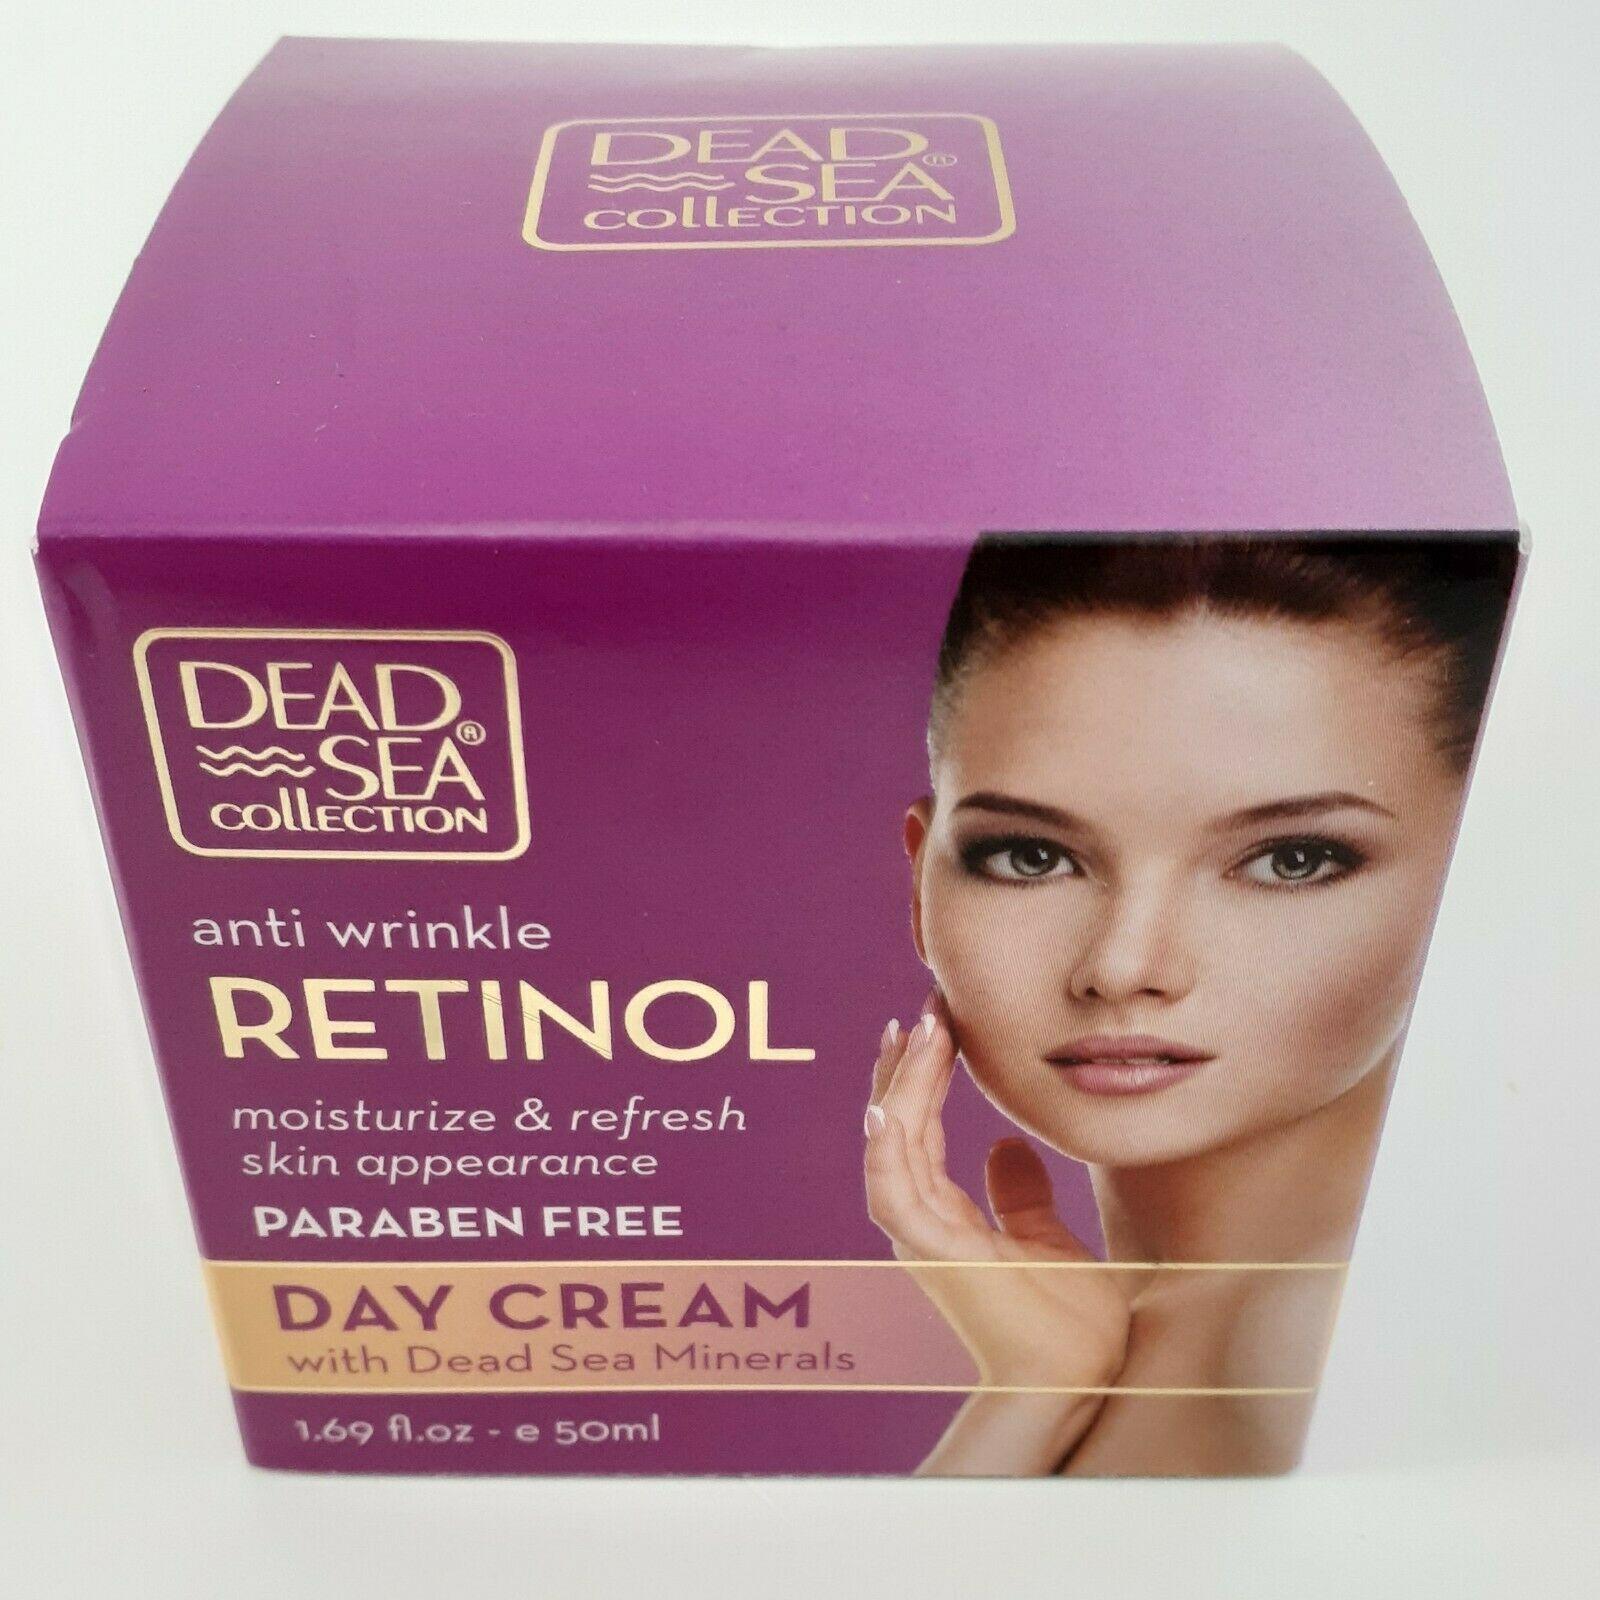 Dead Sea COLLECTION Retinol Anti Wrinkle Day Cream 1.69 oz